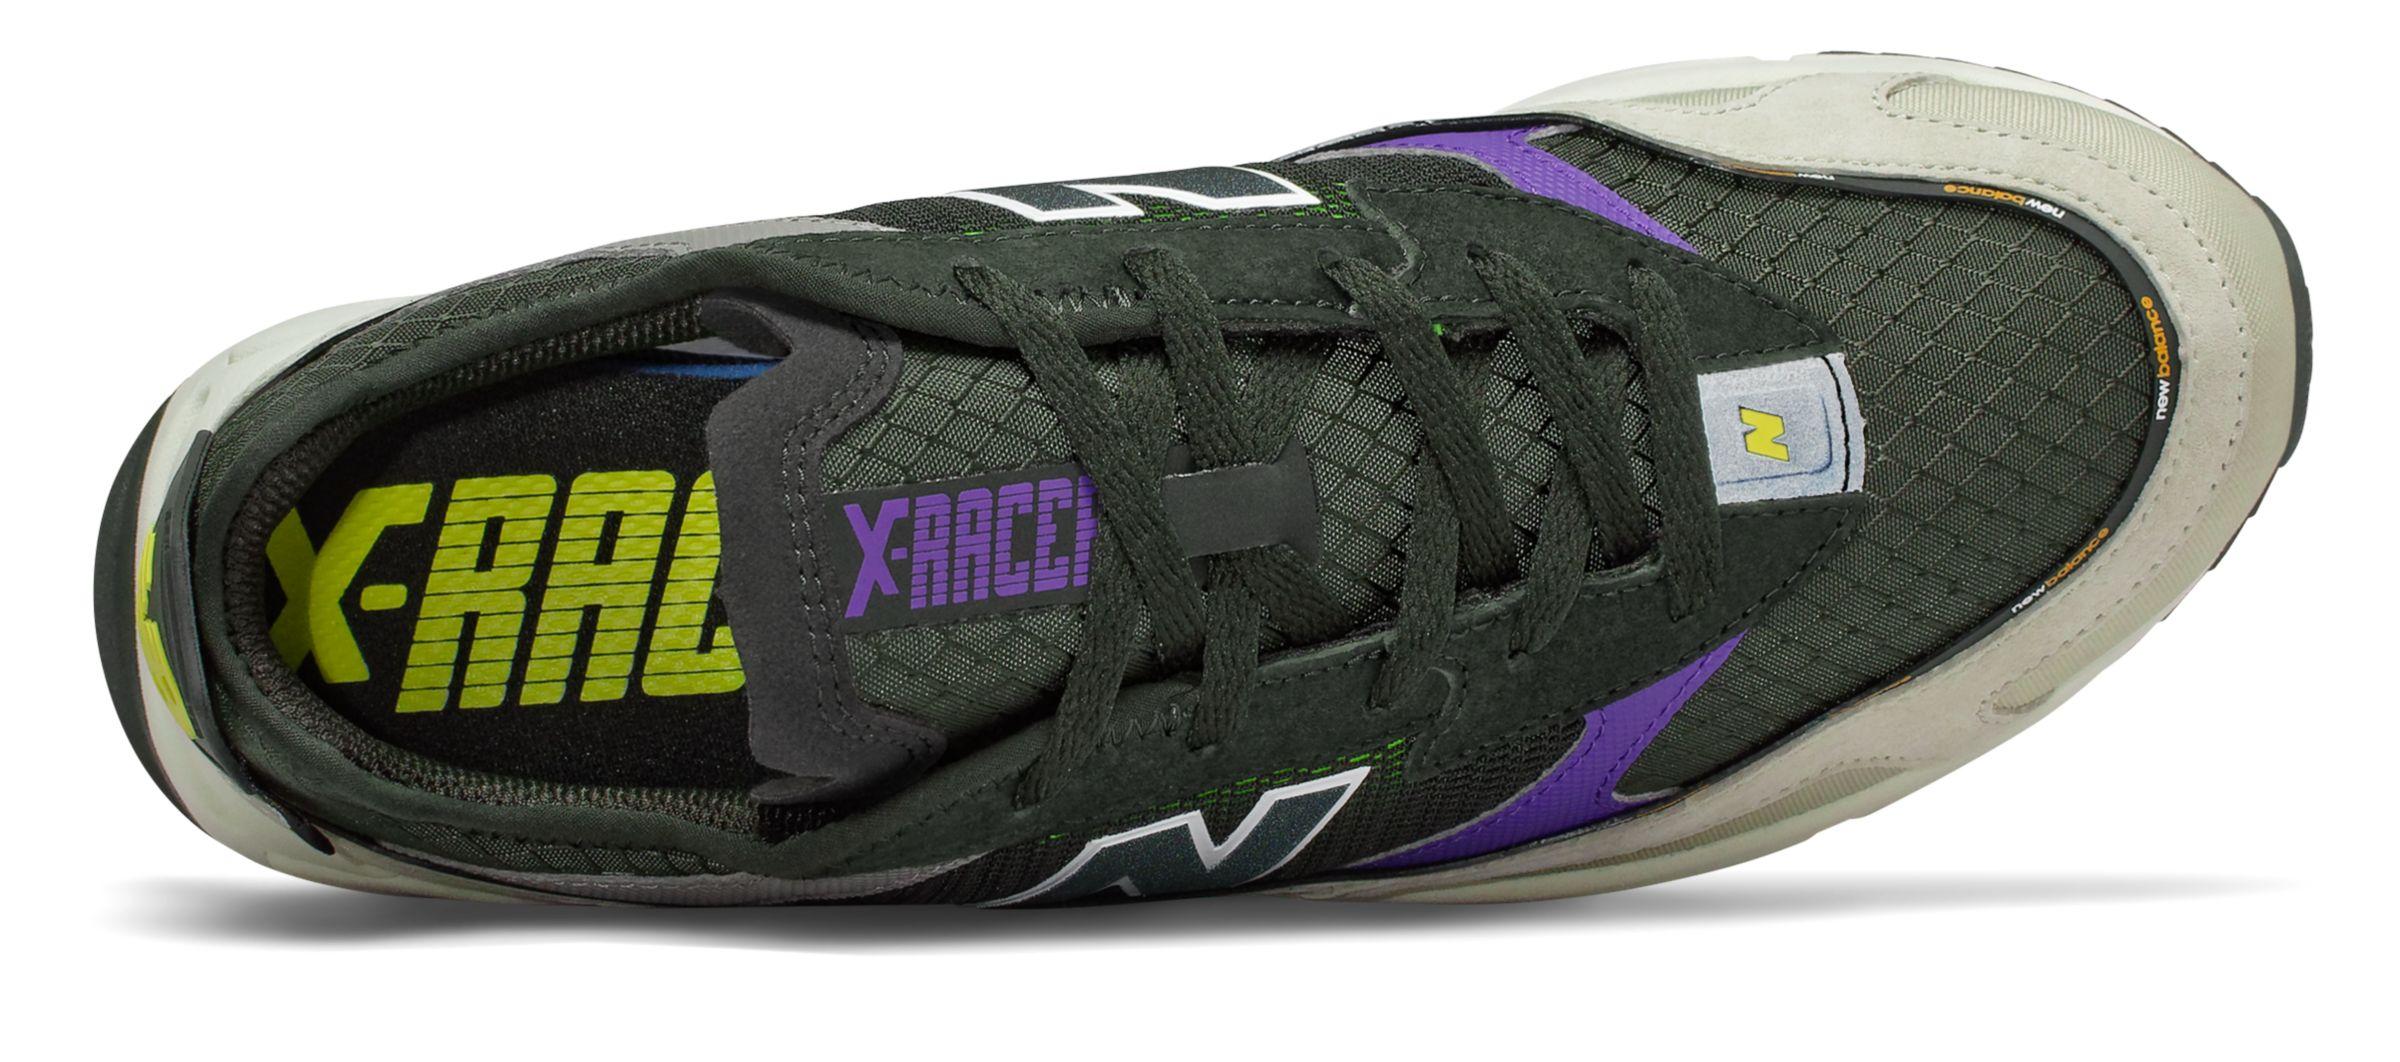 thumbnail 7 - New Balance XRCT Men's Running Sport Lifestyle Shoes